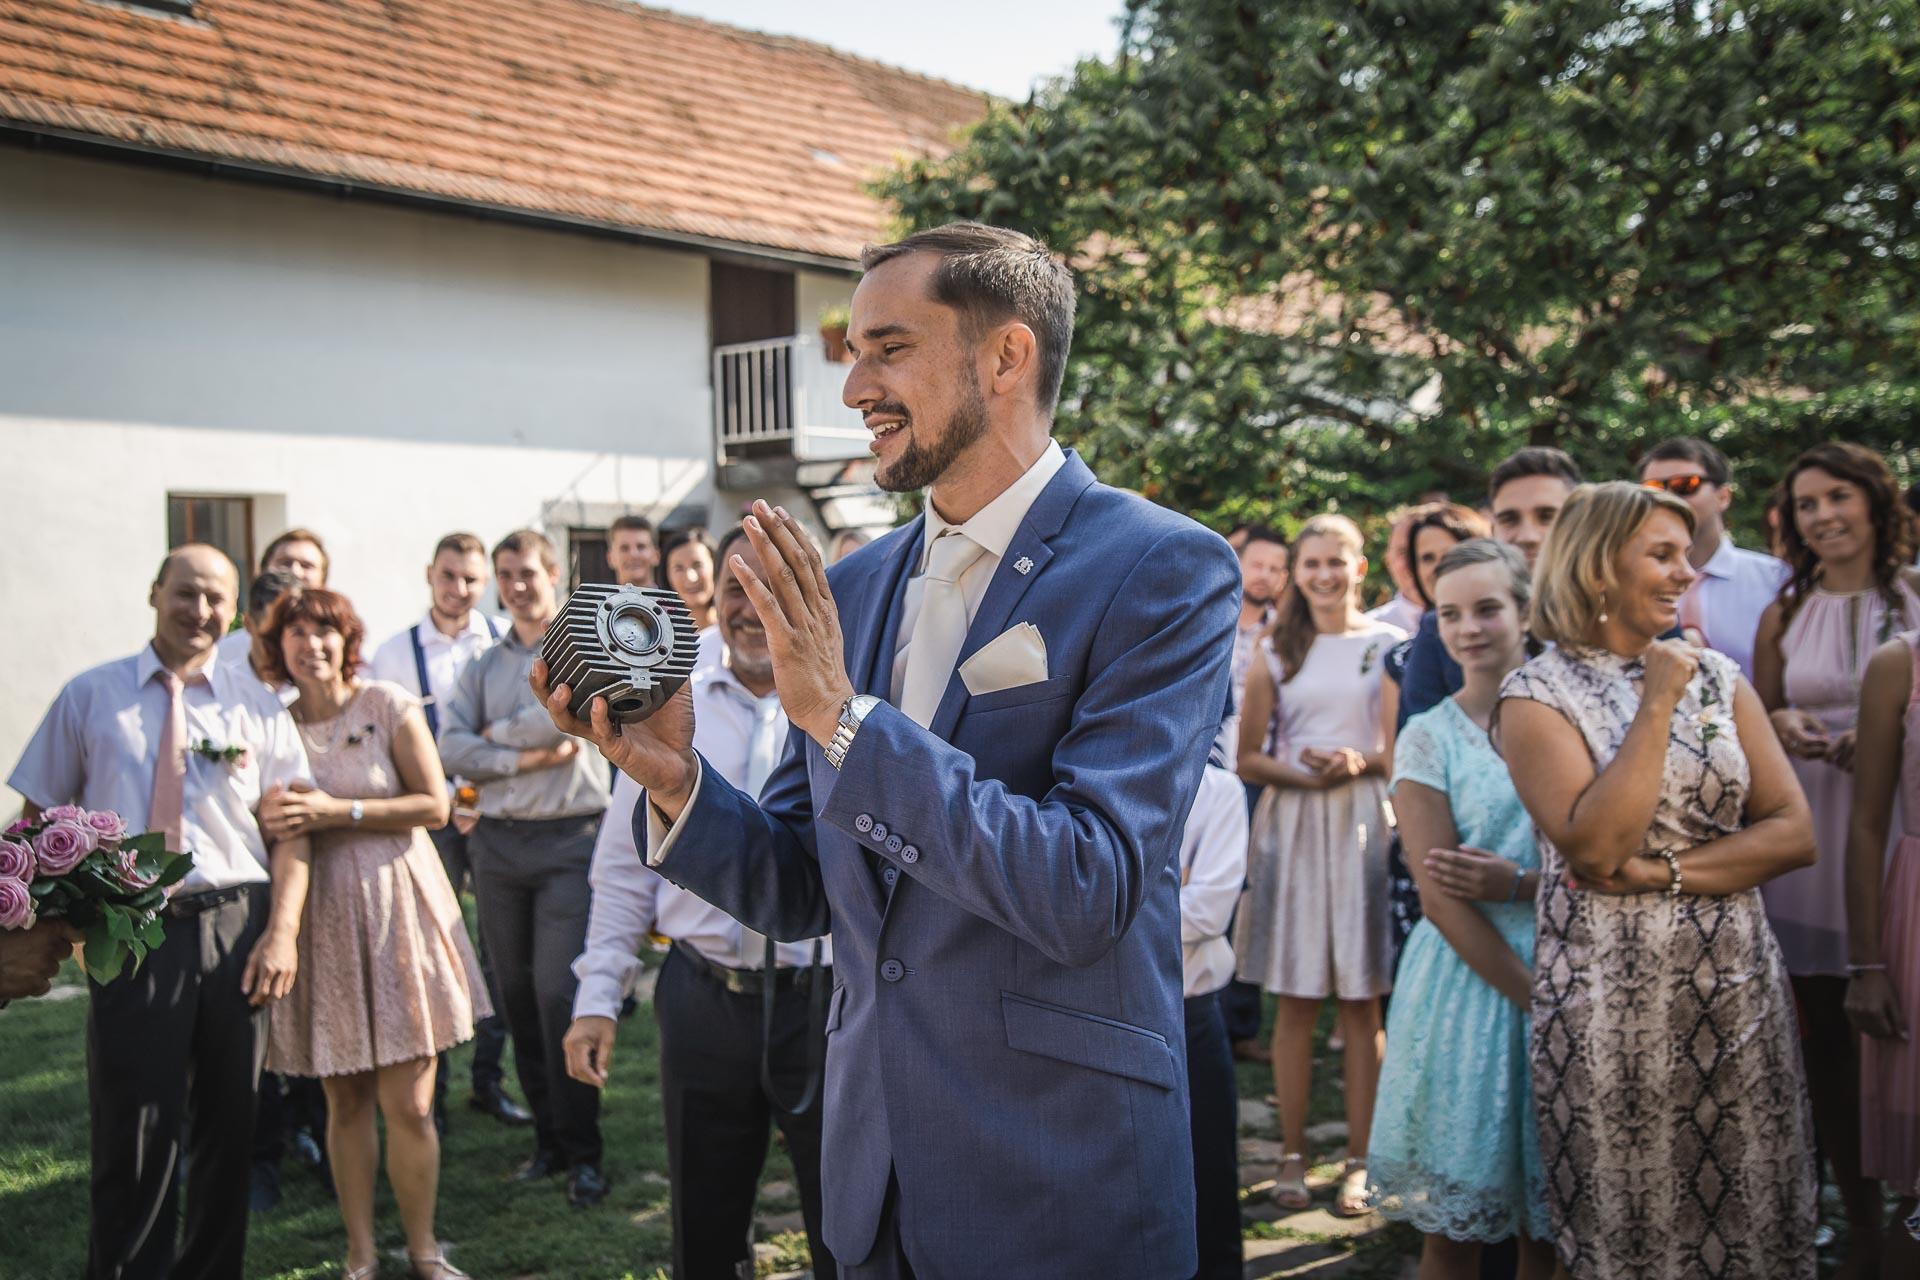 svatební-fotograf-wedding-svatebni-video-orlík-vltava-kostel-statek-stodola-boho-svatba-Beautyfoto-119